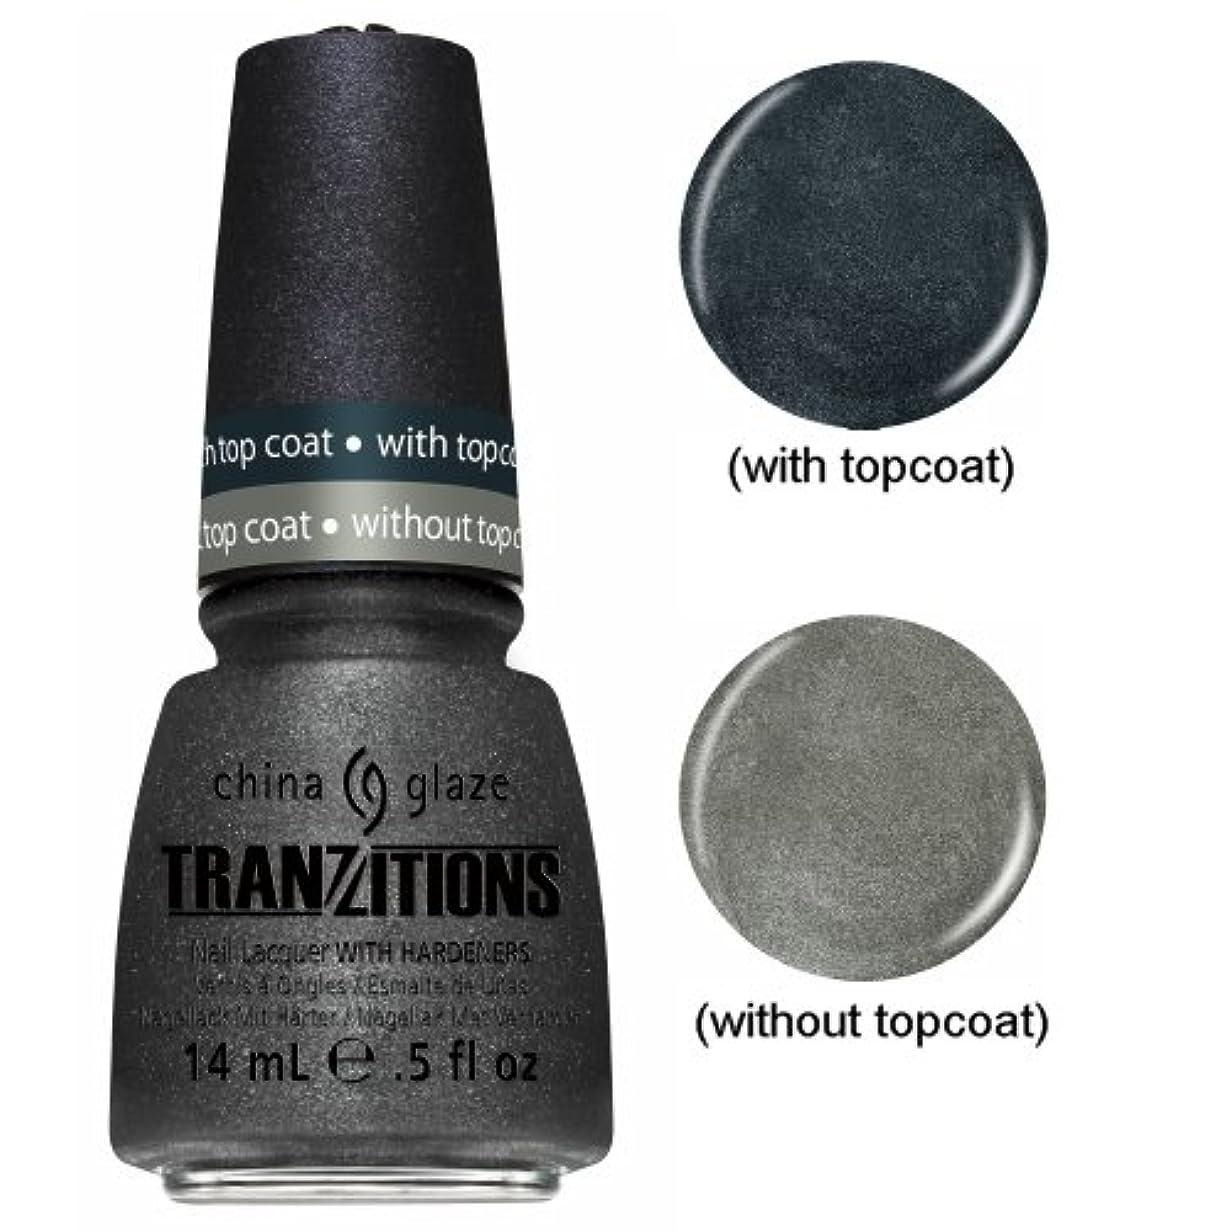 継続中少数水CHINA GLAZE Nail Lacquer - Tranzitions - Metallic Metamorphosis (並行輸入品)